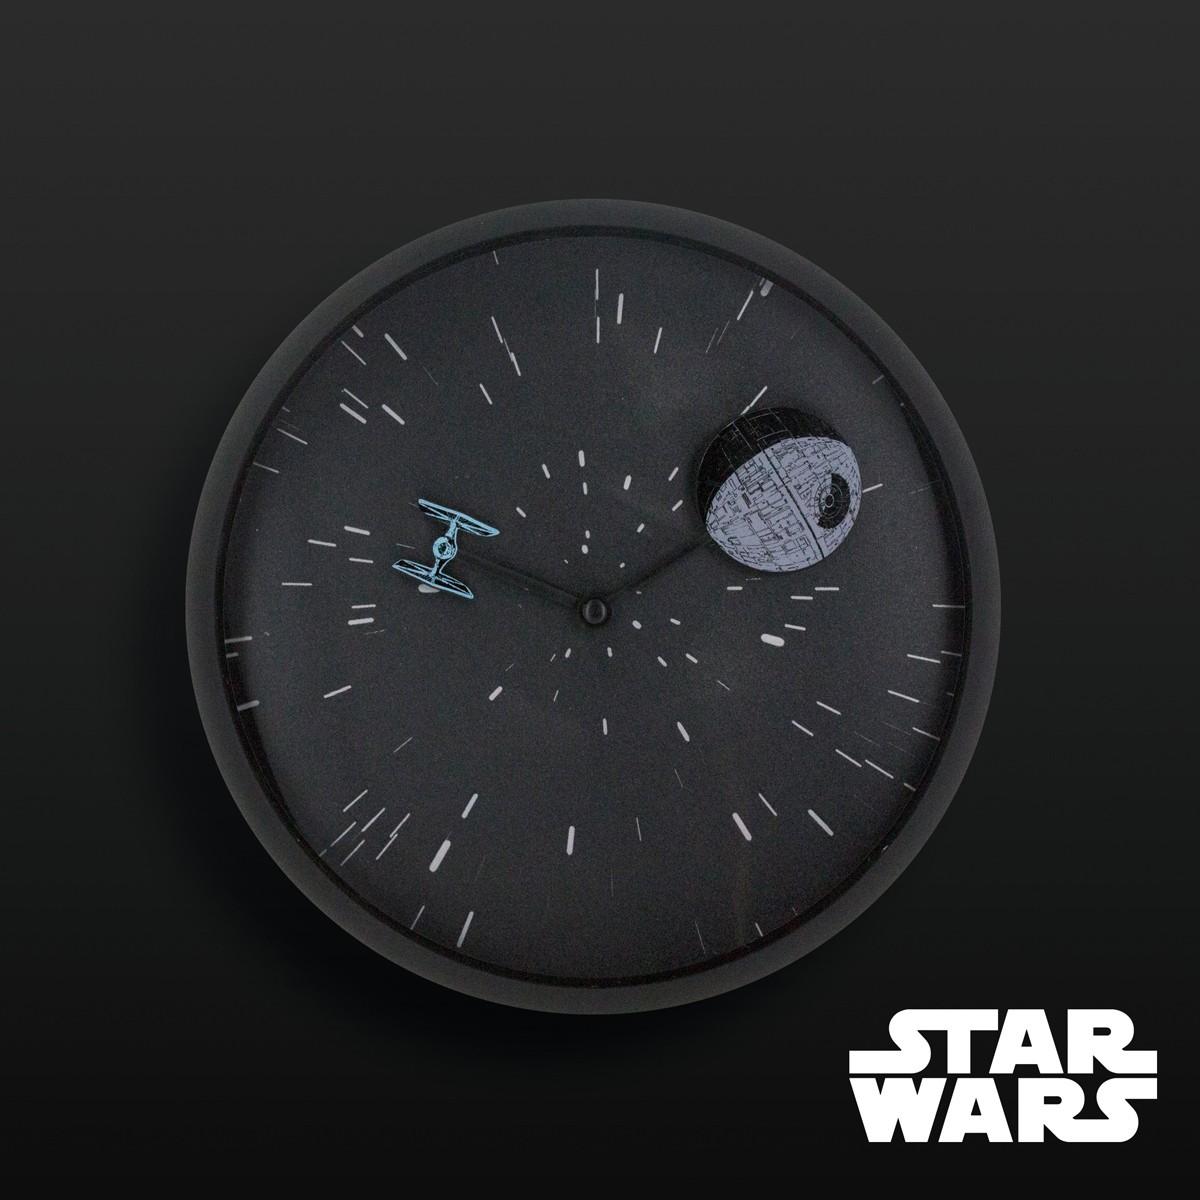 Horloge star wars : pendule murale design avec etoile de la mort ...